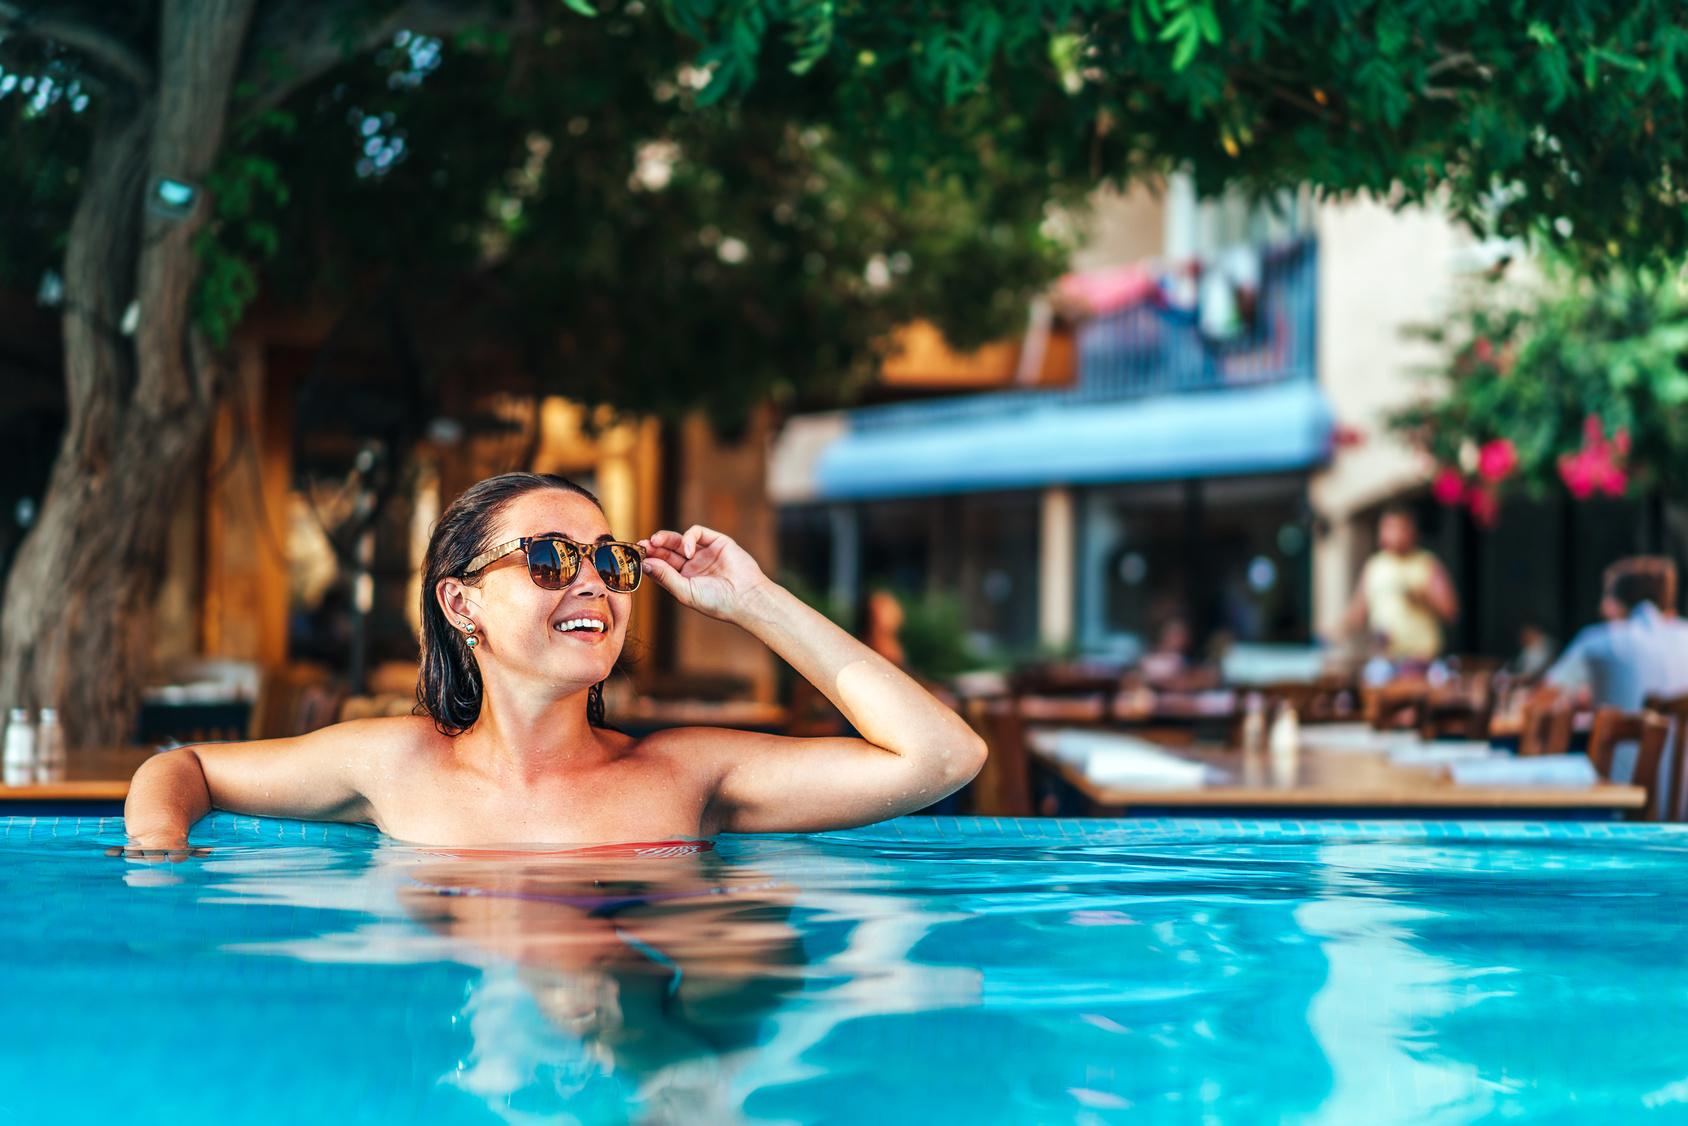 Pretty brunette girl sunbathing at the swimming pool